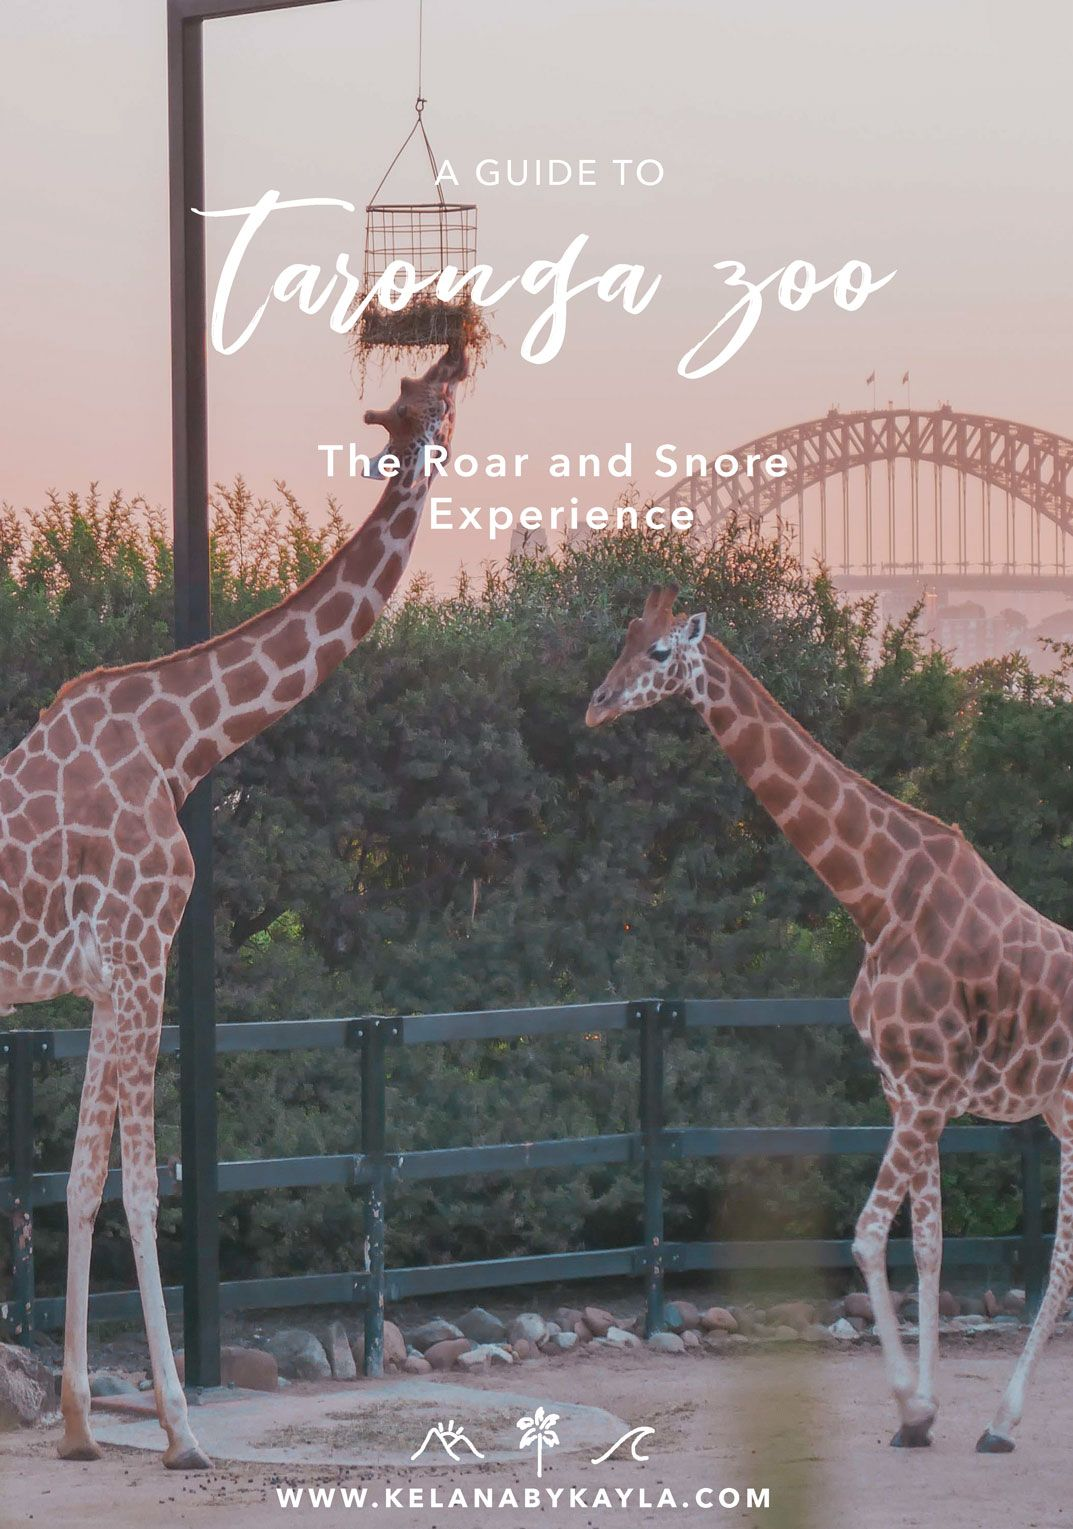 Taronga Zoo The Roar And Snore Experience Oceania Travel Australia Travel Guide Australia Travel